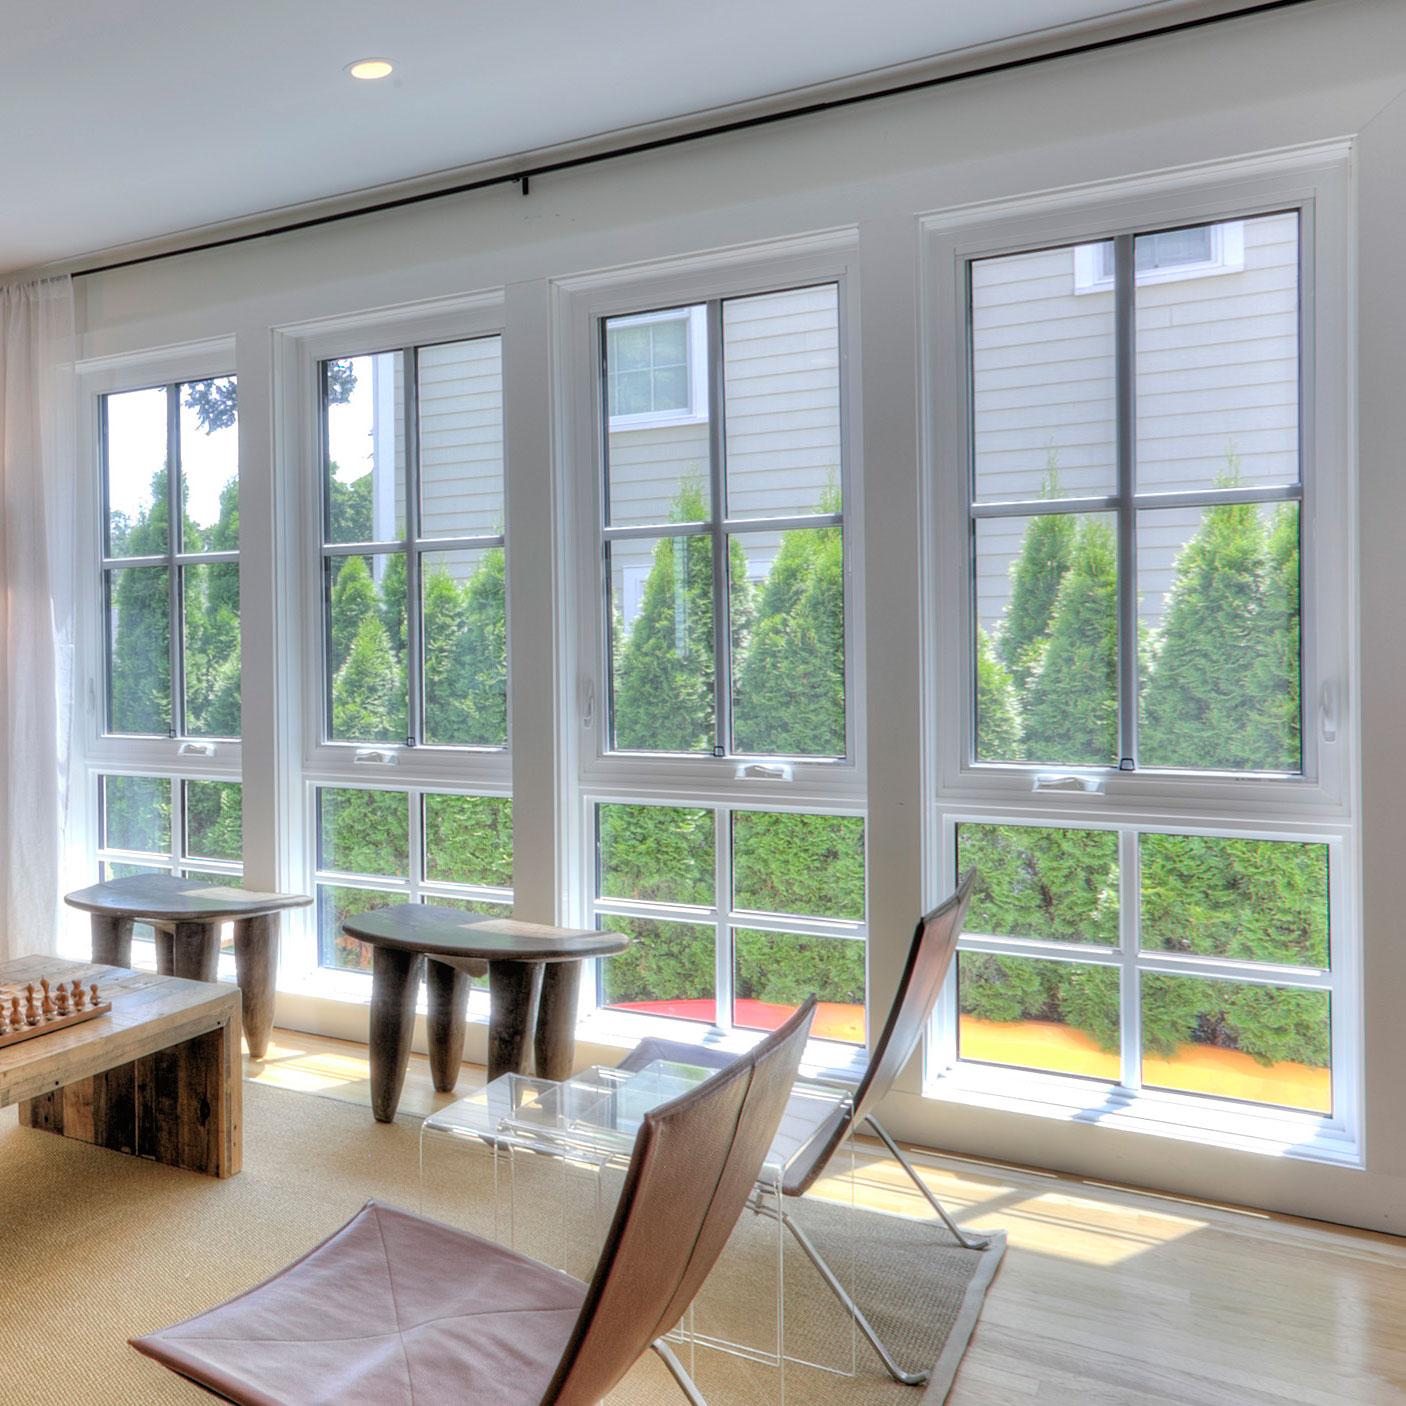 house-parts-windows.jpg